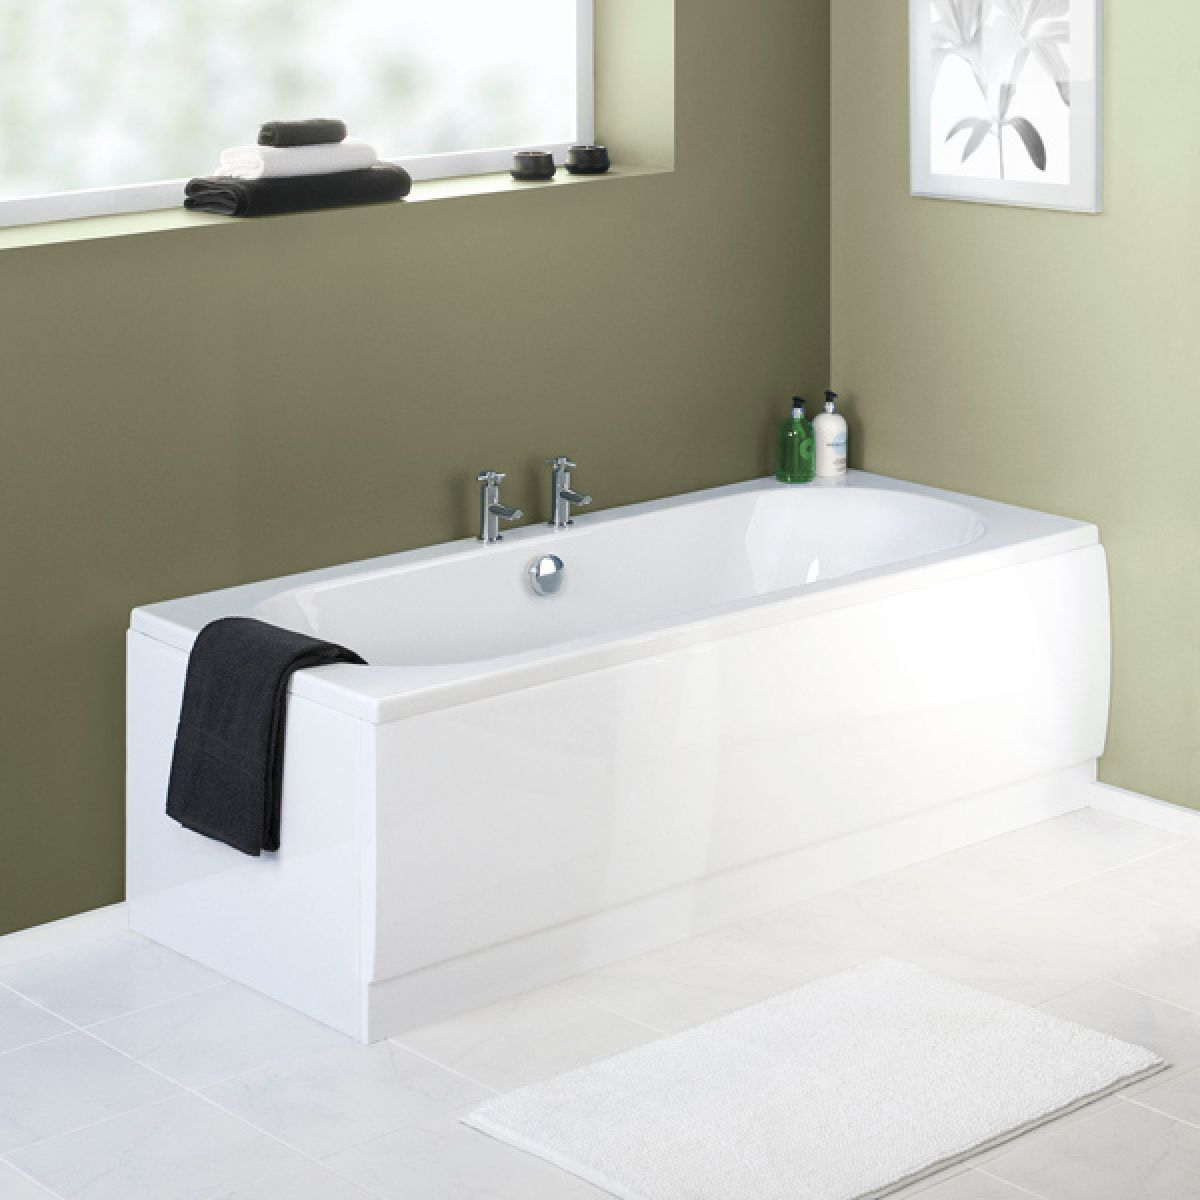 Premier Acrylic White End Bath Panel 800mm